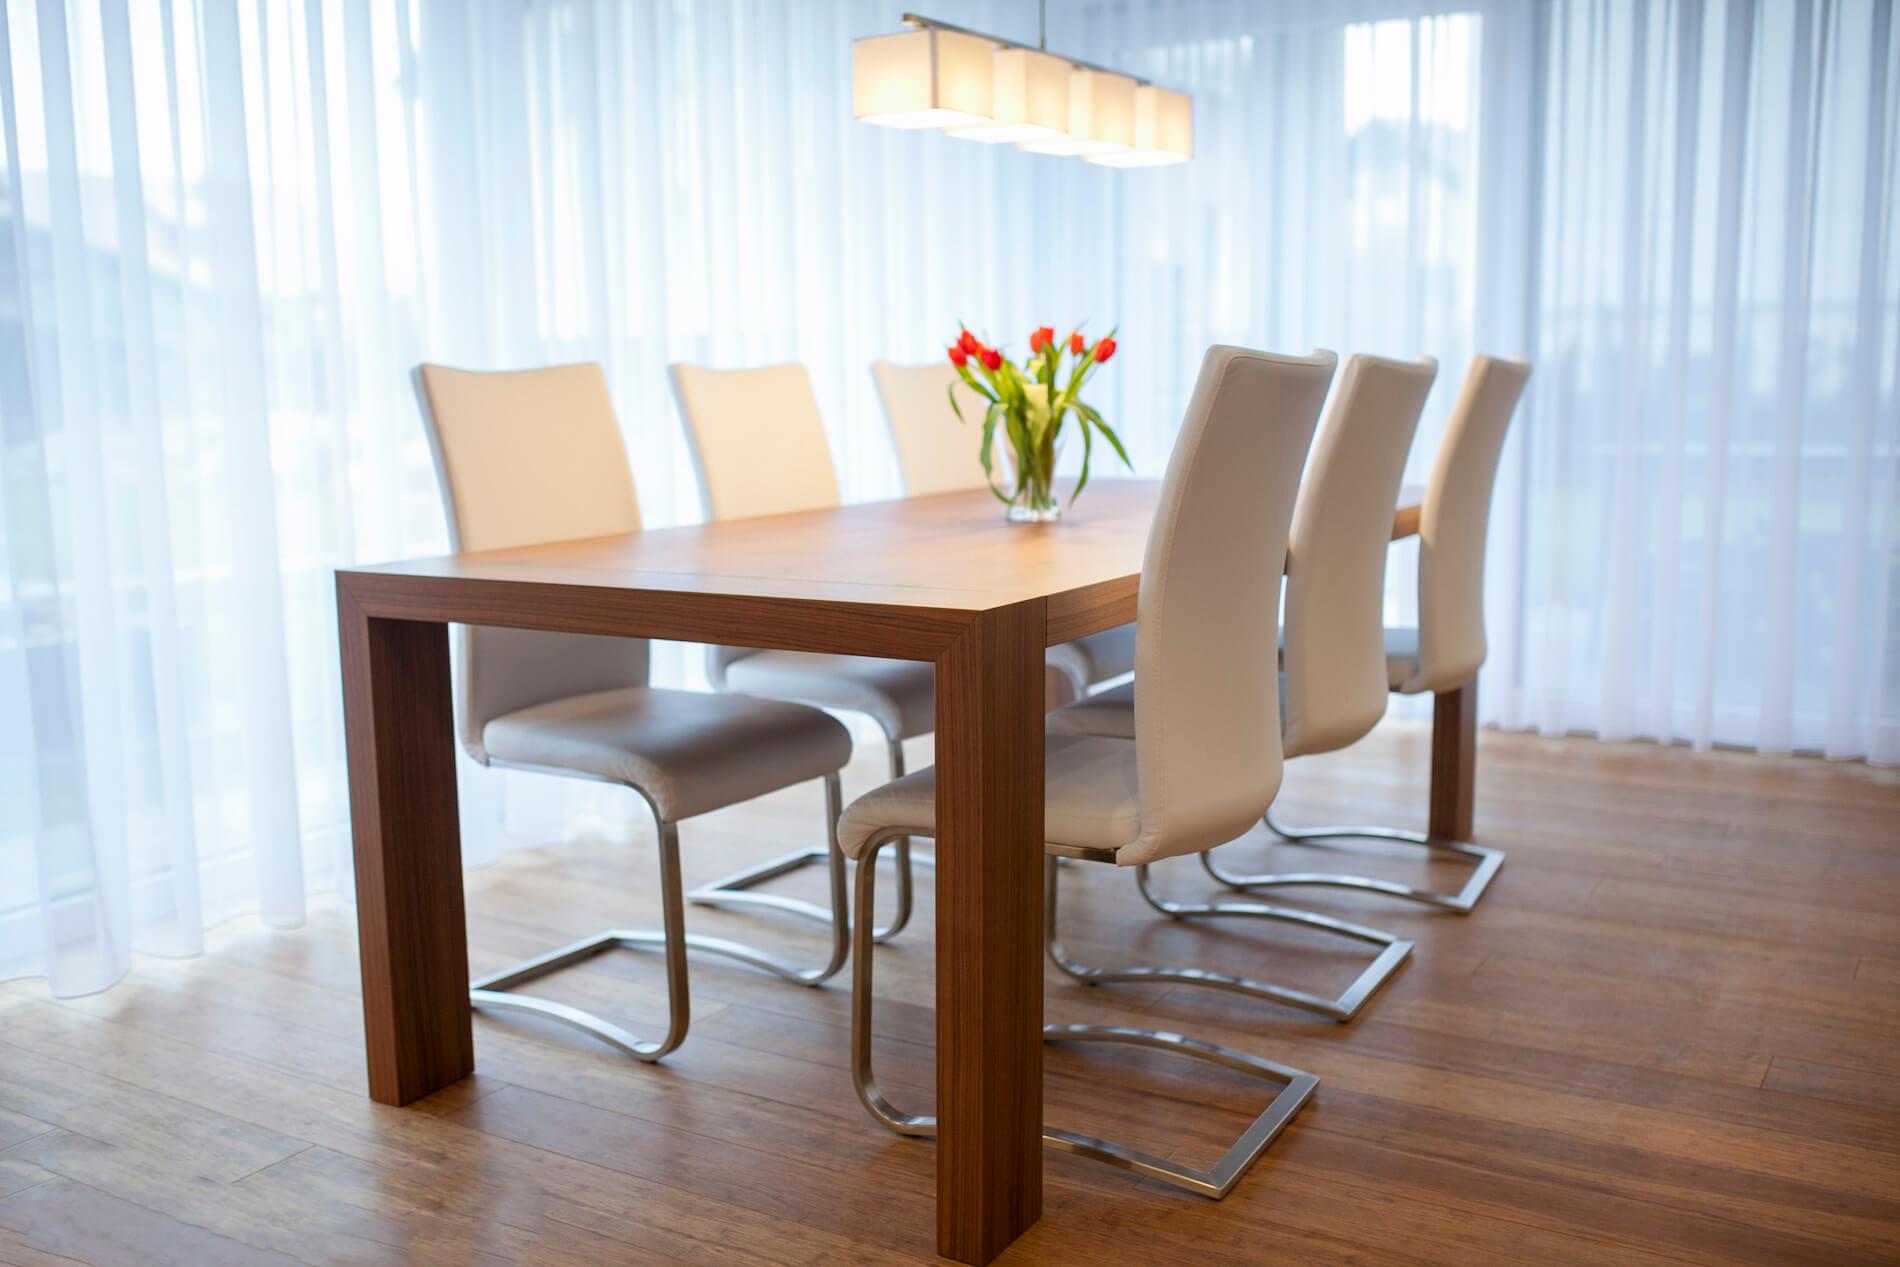 miza za jedilnico furnirana po naročilu